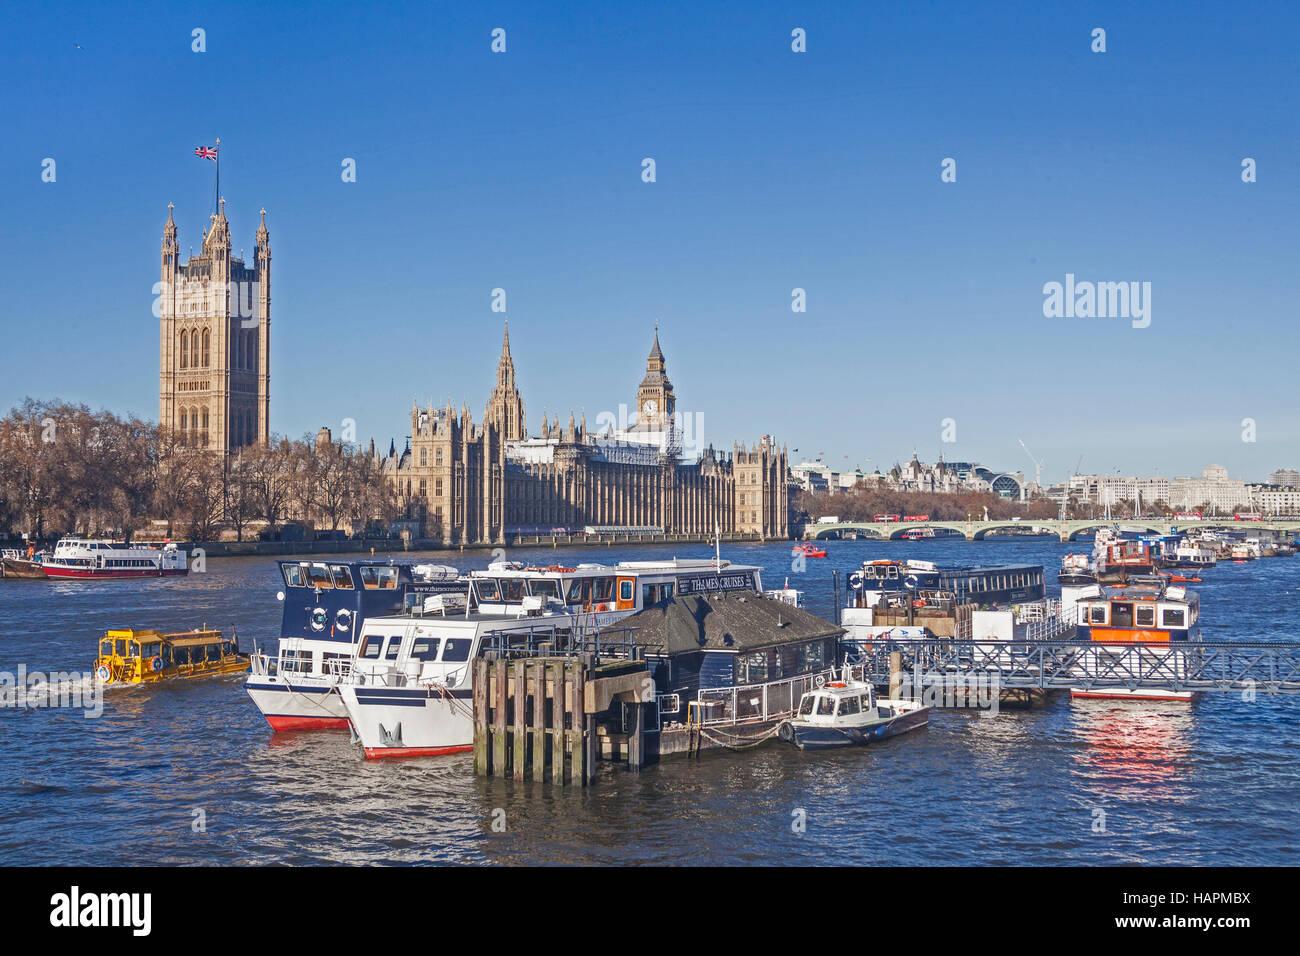 London, Westminster  A flotilla of pleasure cruisers moored between Westminster and Lambeth Bridges - Stock Image